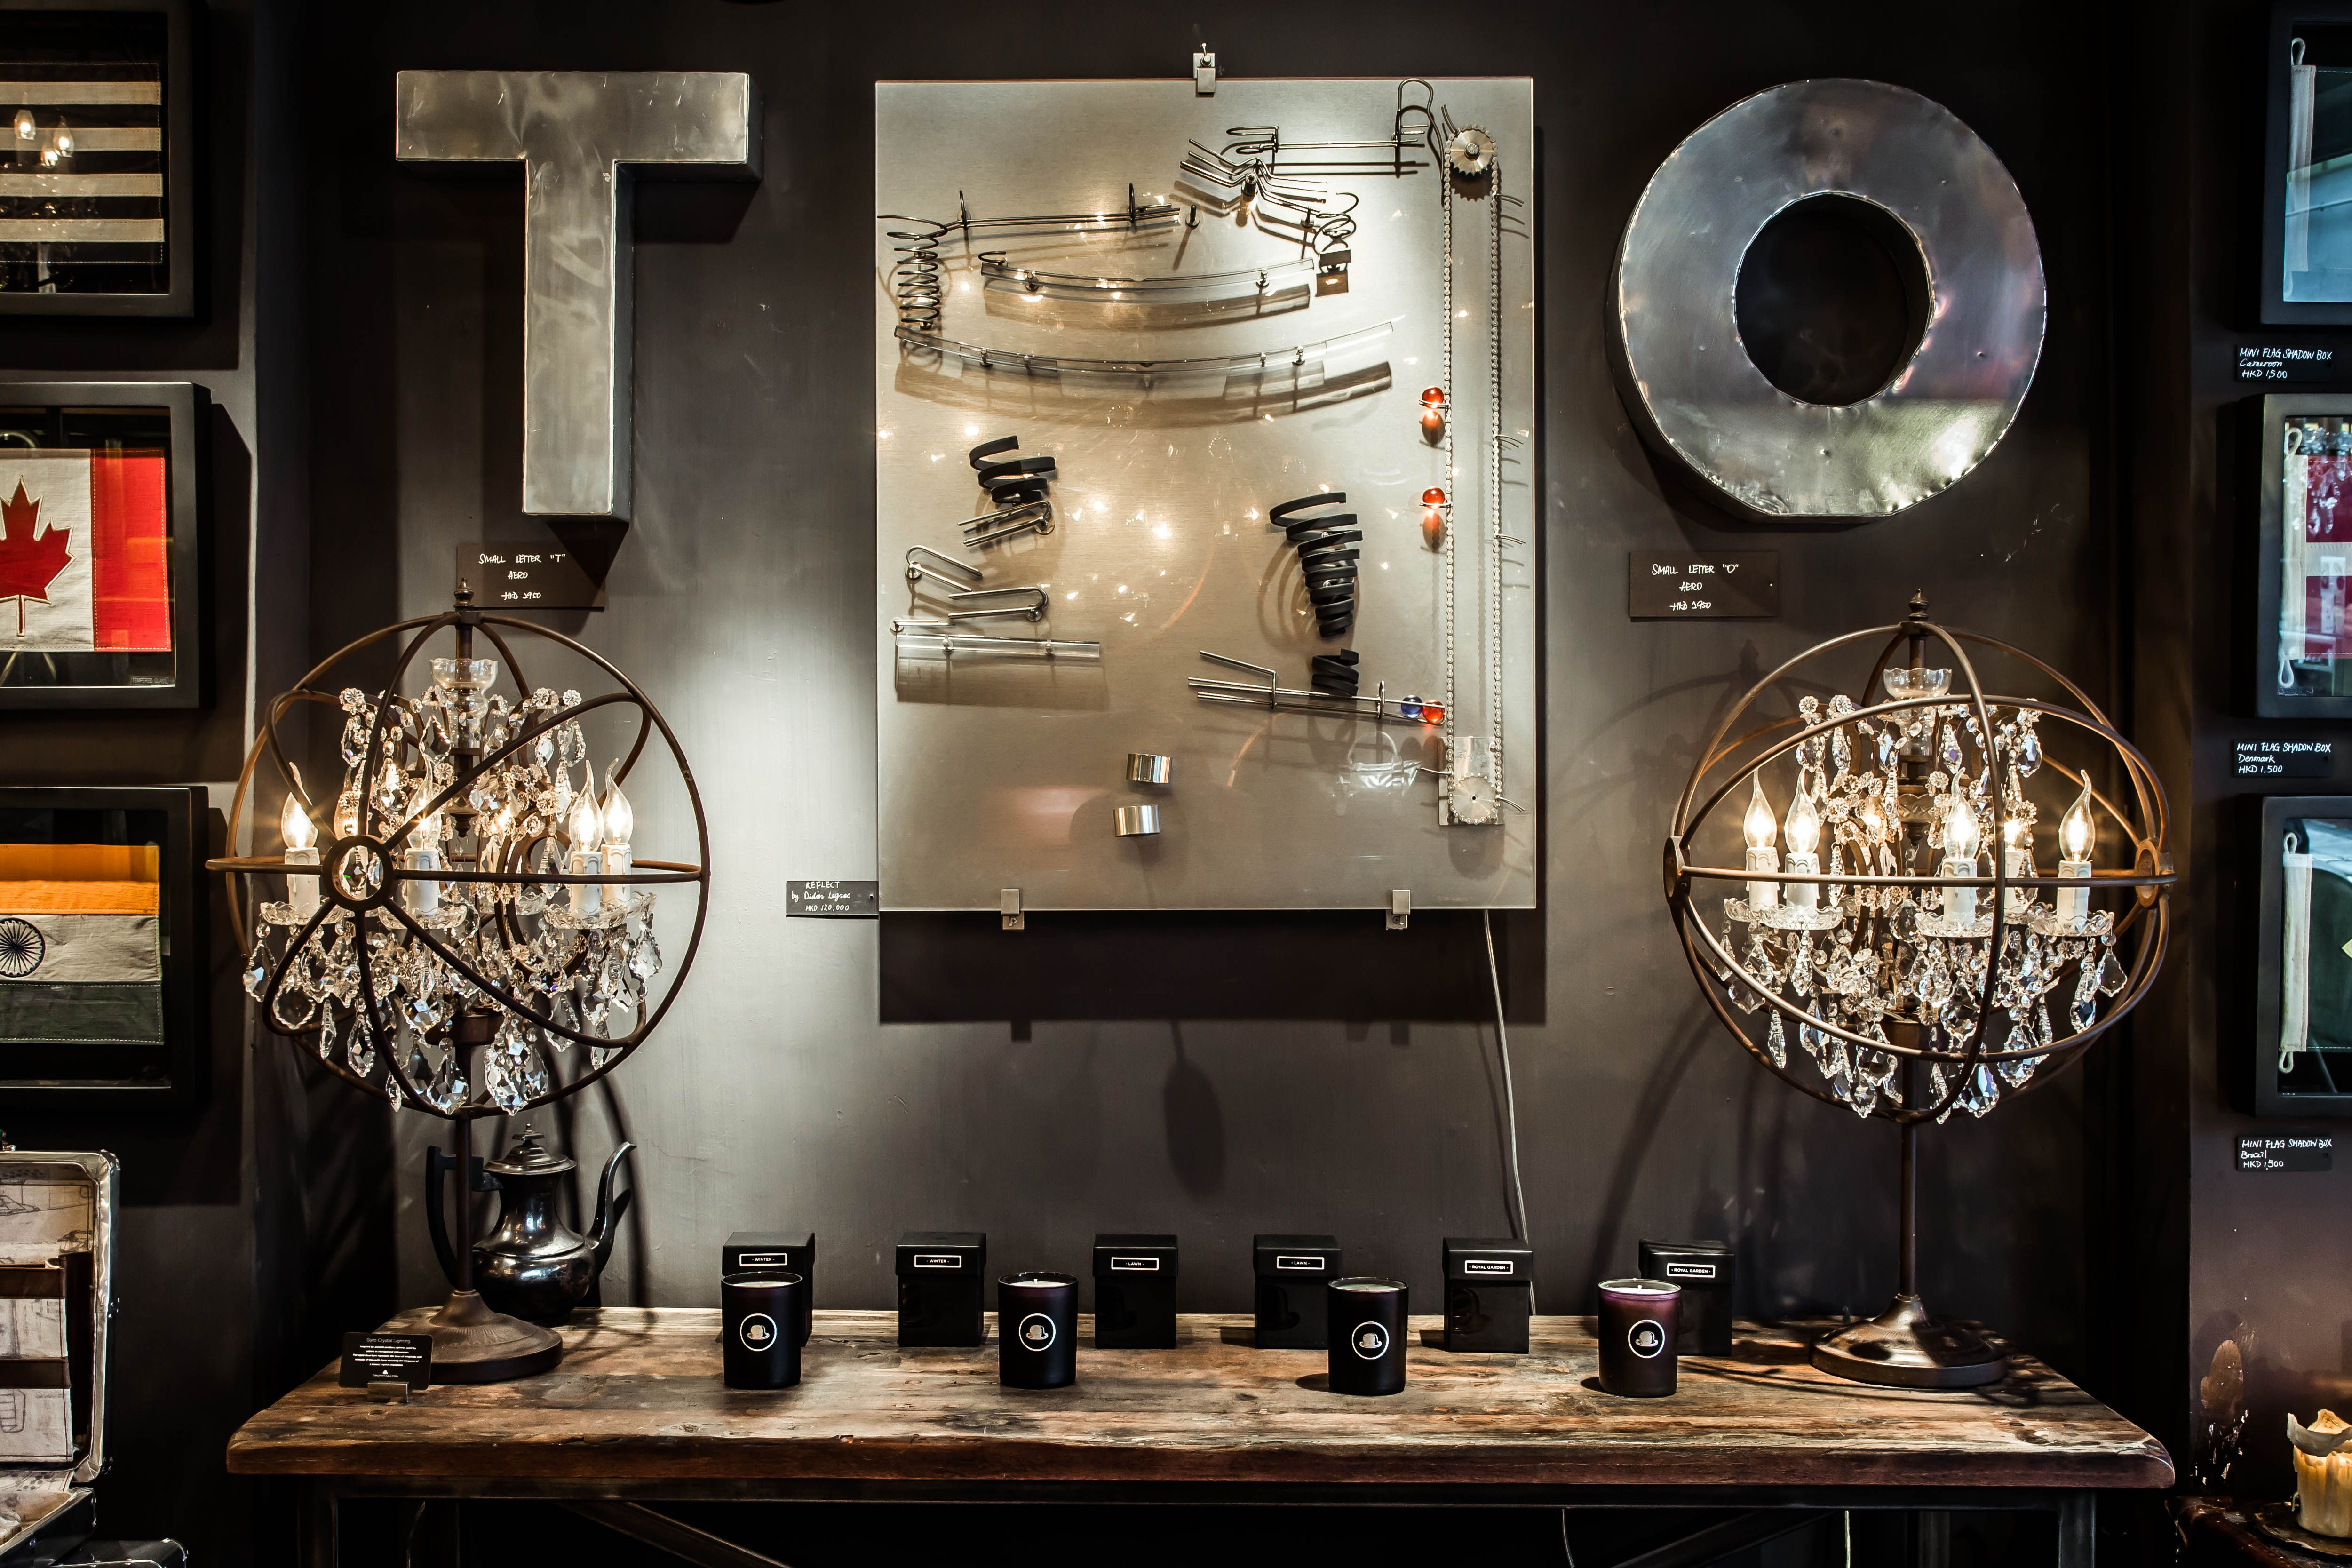 Timothy Oulton Gyro Crystal Lamp Http Www Timothyoulton Com Usa En Gyro Crystal Table Lamp Html Crystal Table Lamps Space Decor Table Lamp